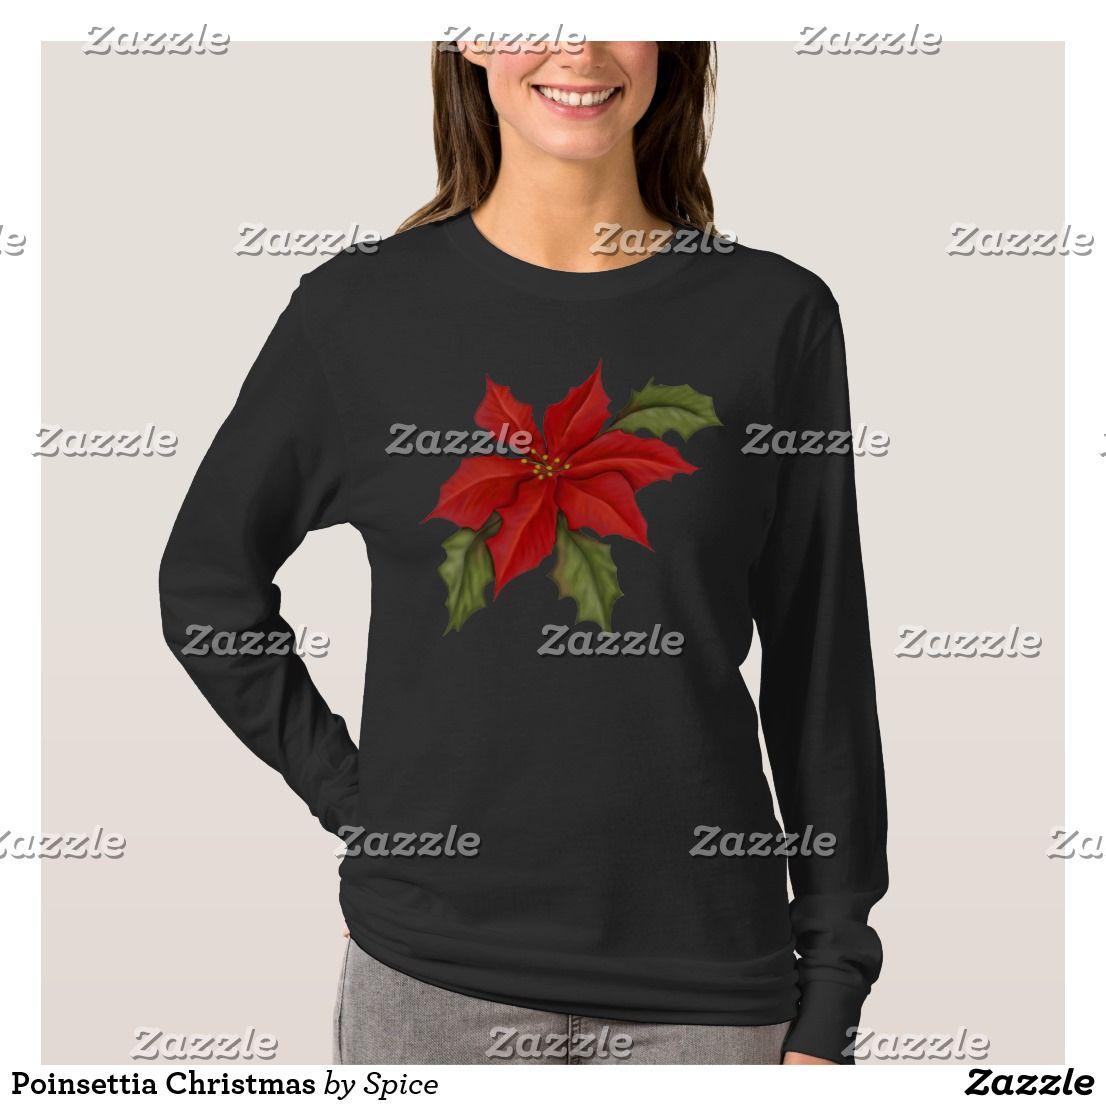 Poinsettia Christmas T Shirt Zazzle Com